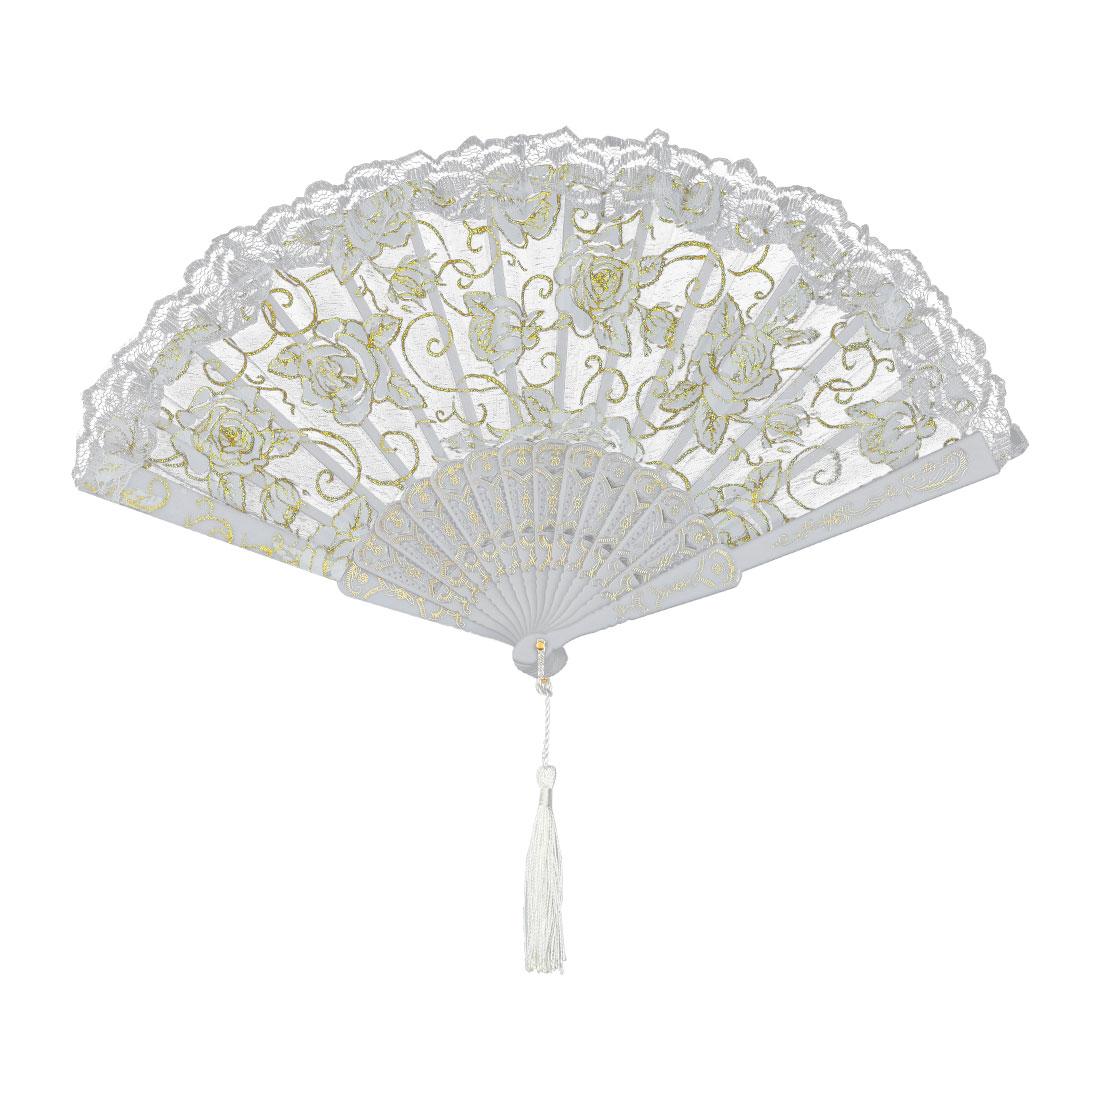 Polyester Tassel Pendant Decor Summer Cooling Folding Hand Fan White Gold Tone